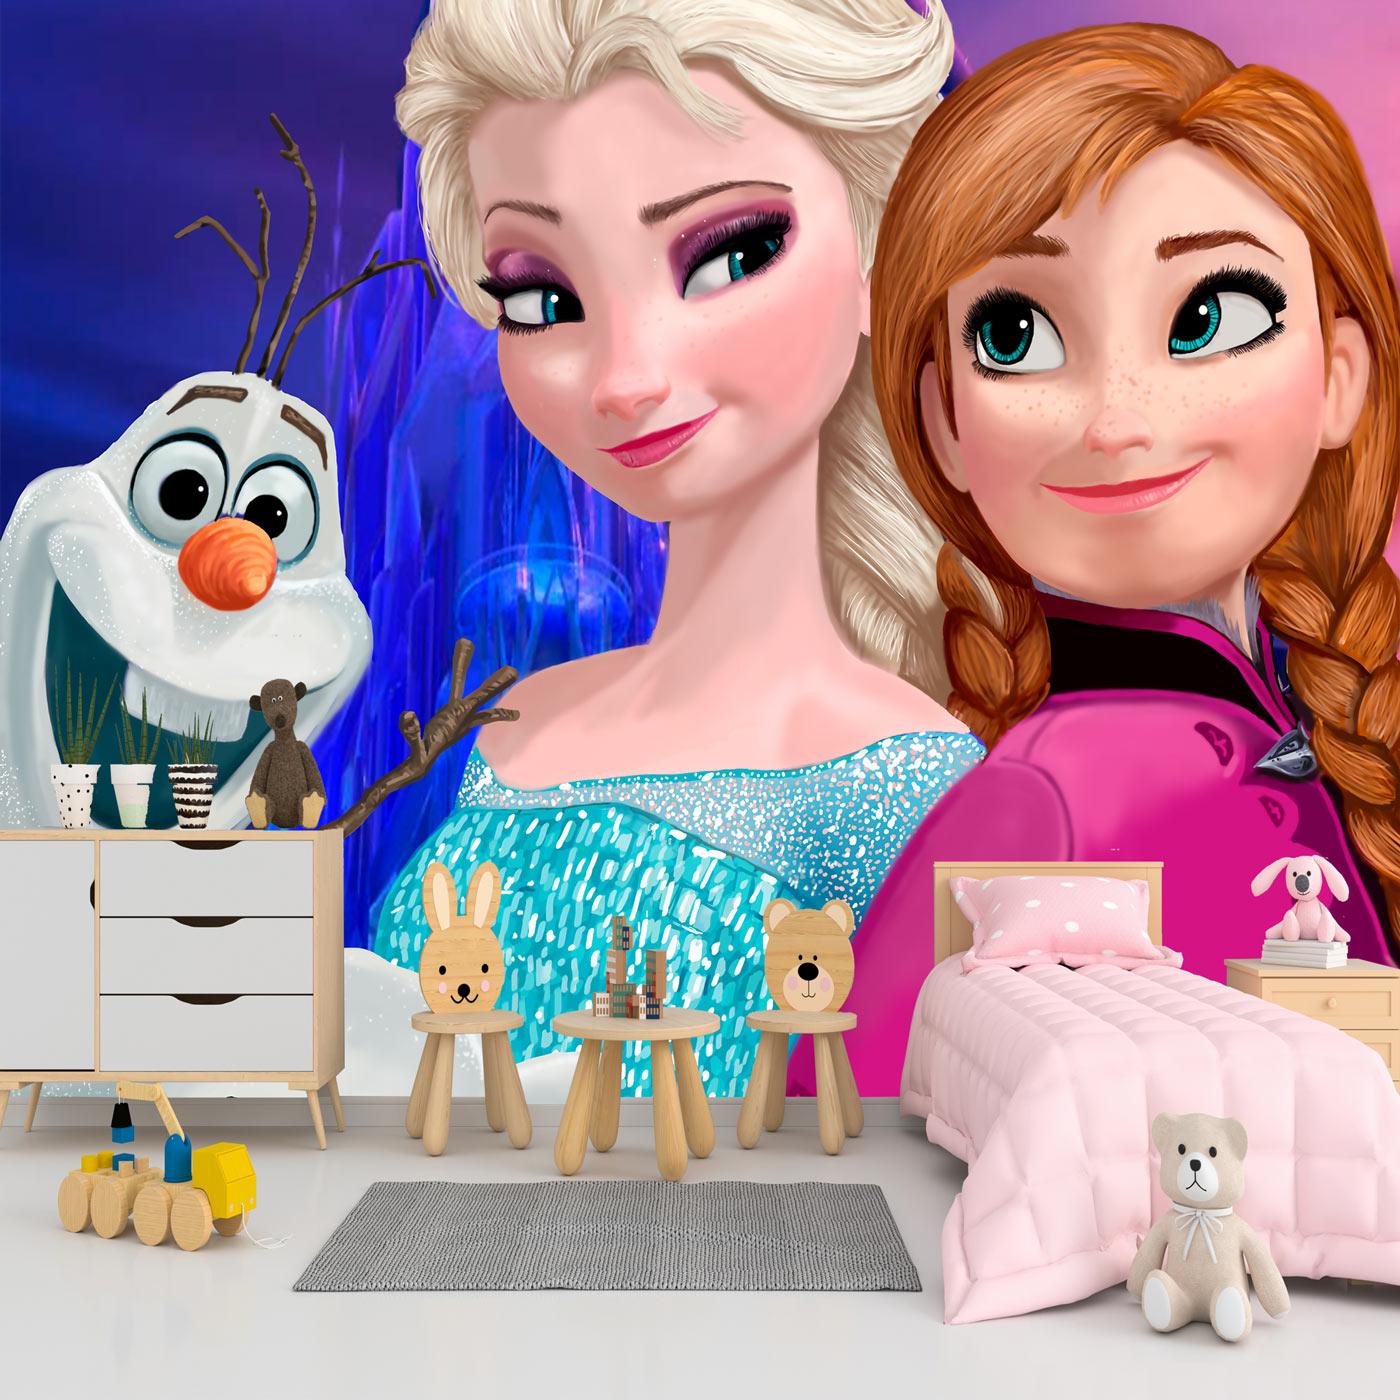 Papel de Parede Adesivo, Infantil Frozen com Olaf 1X1  - Final Decor